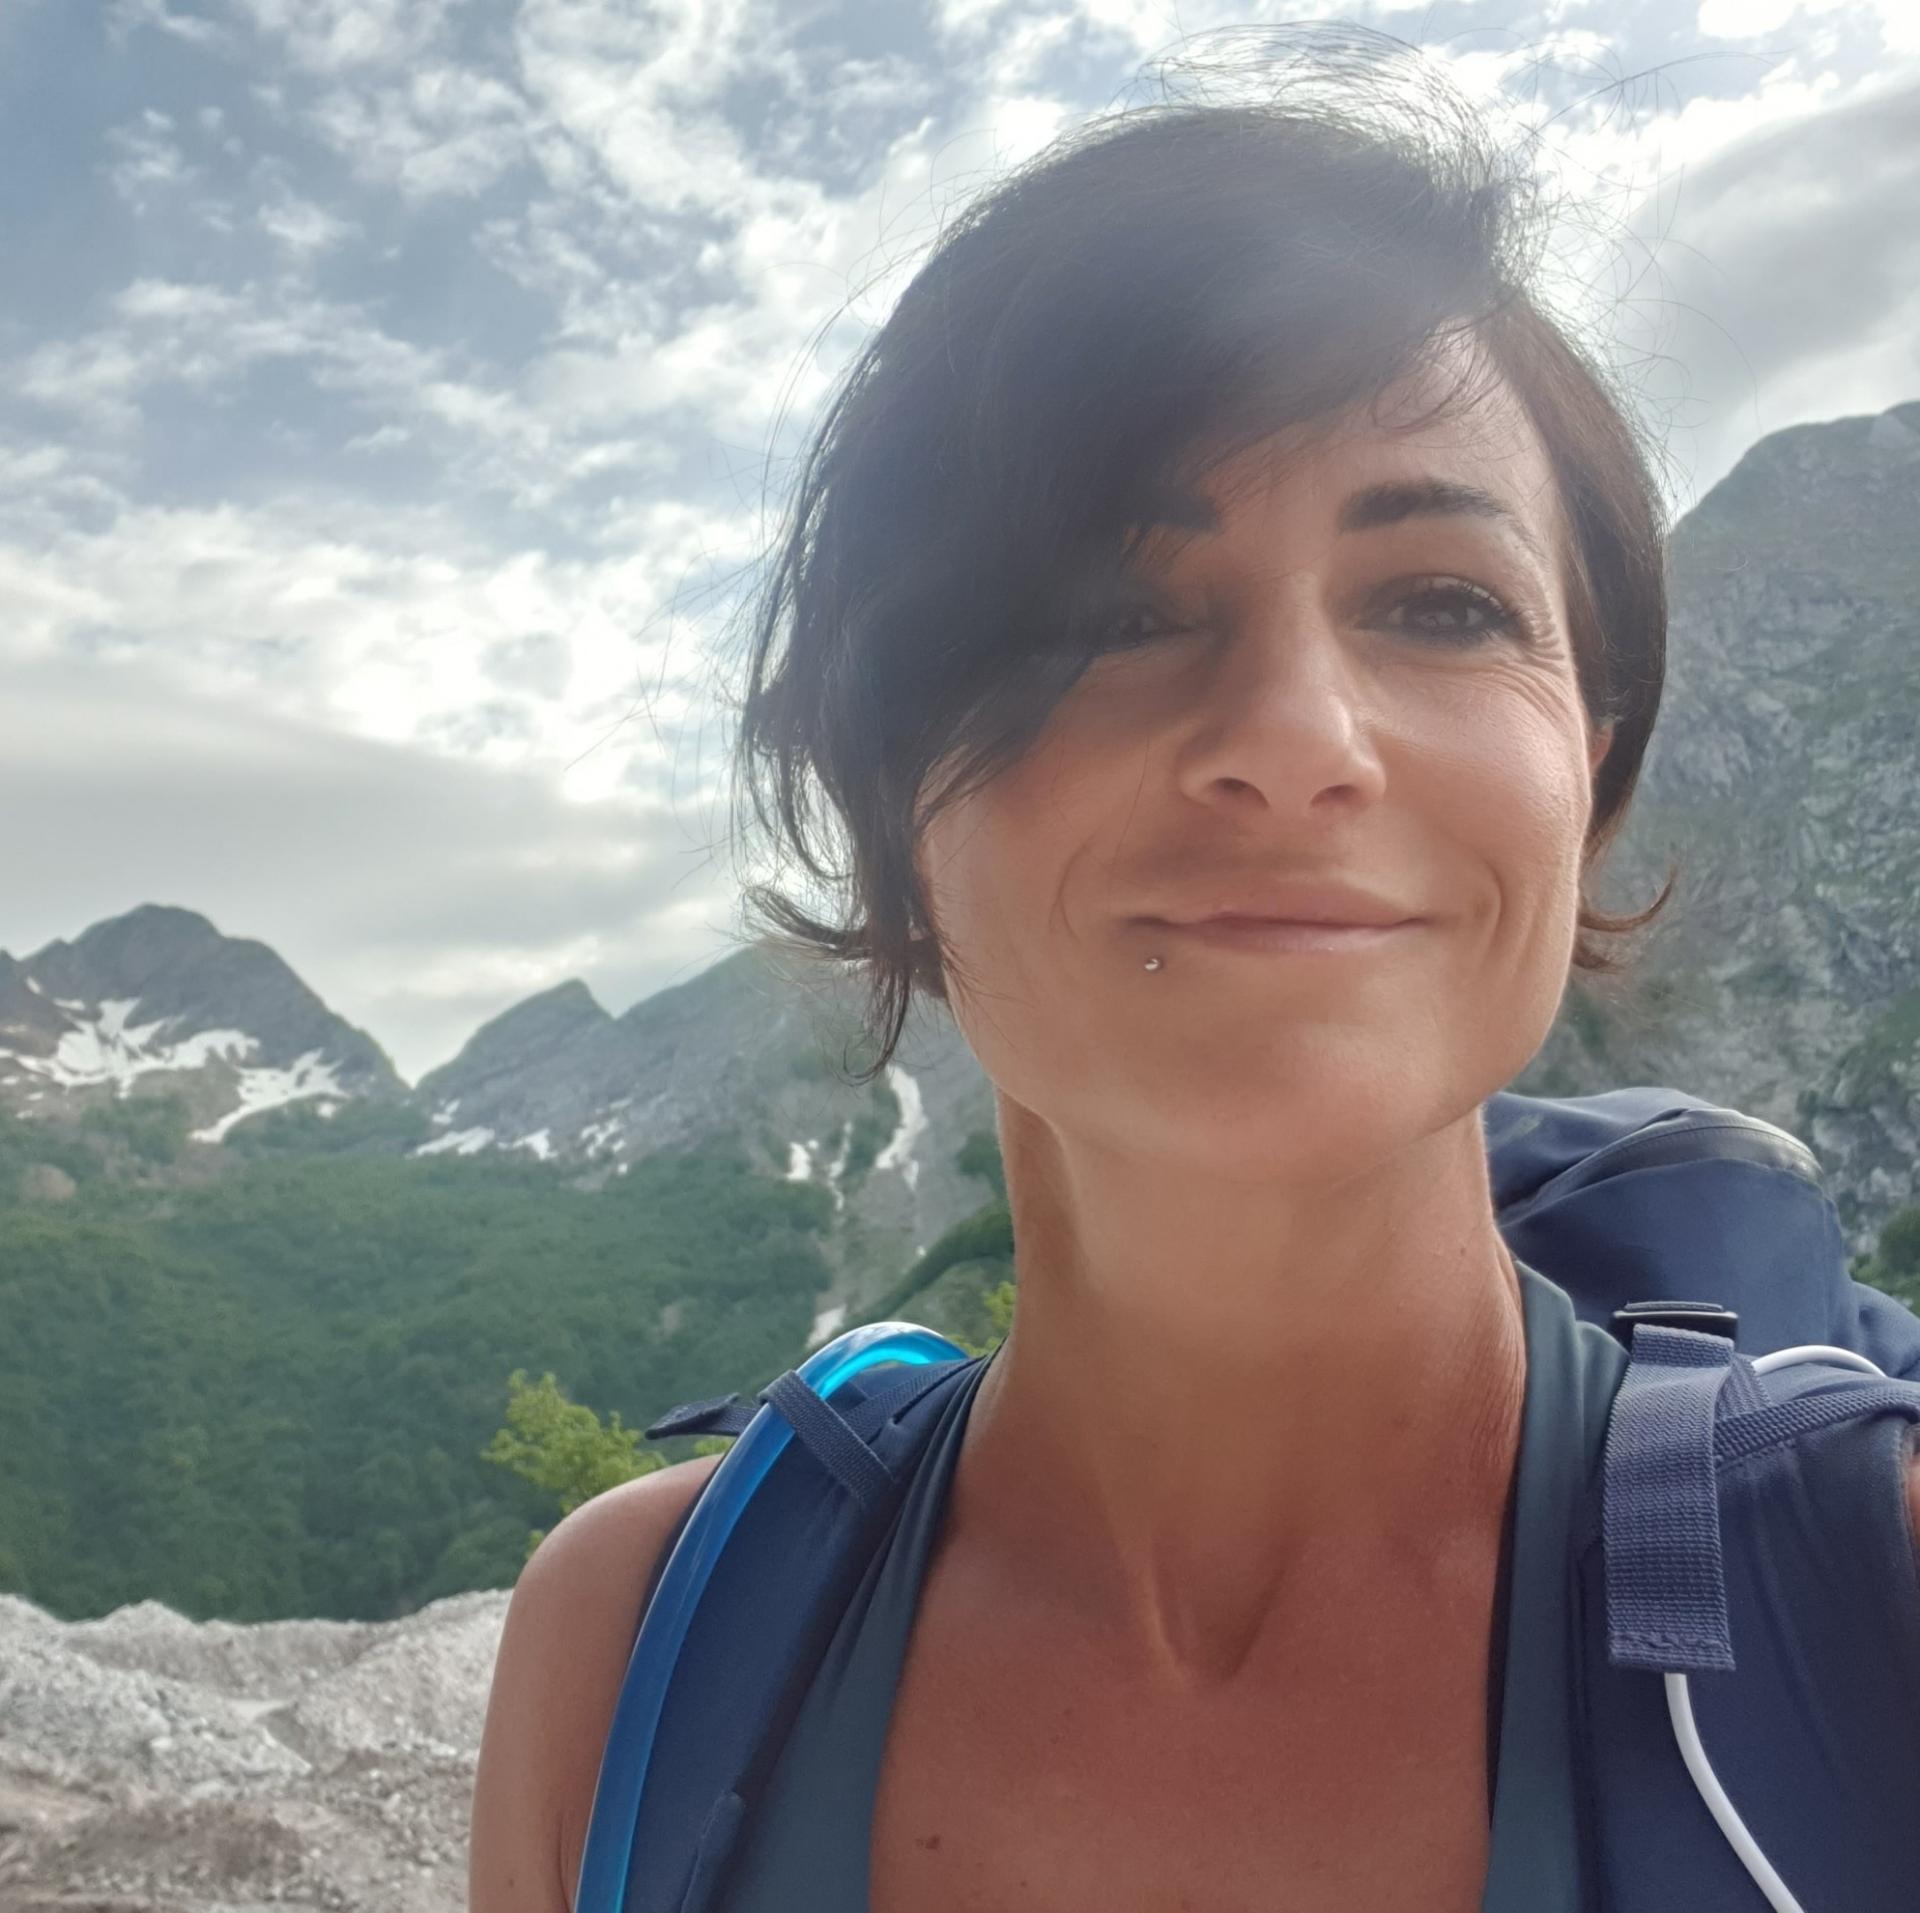 Cronaca, Massa Carrara: tragedia sulle Alpi Apuane